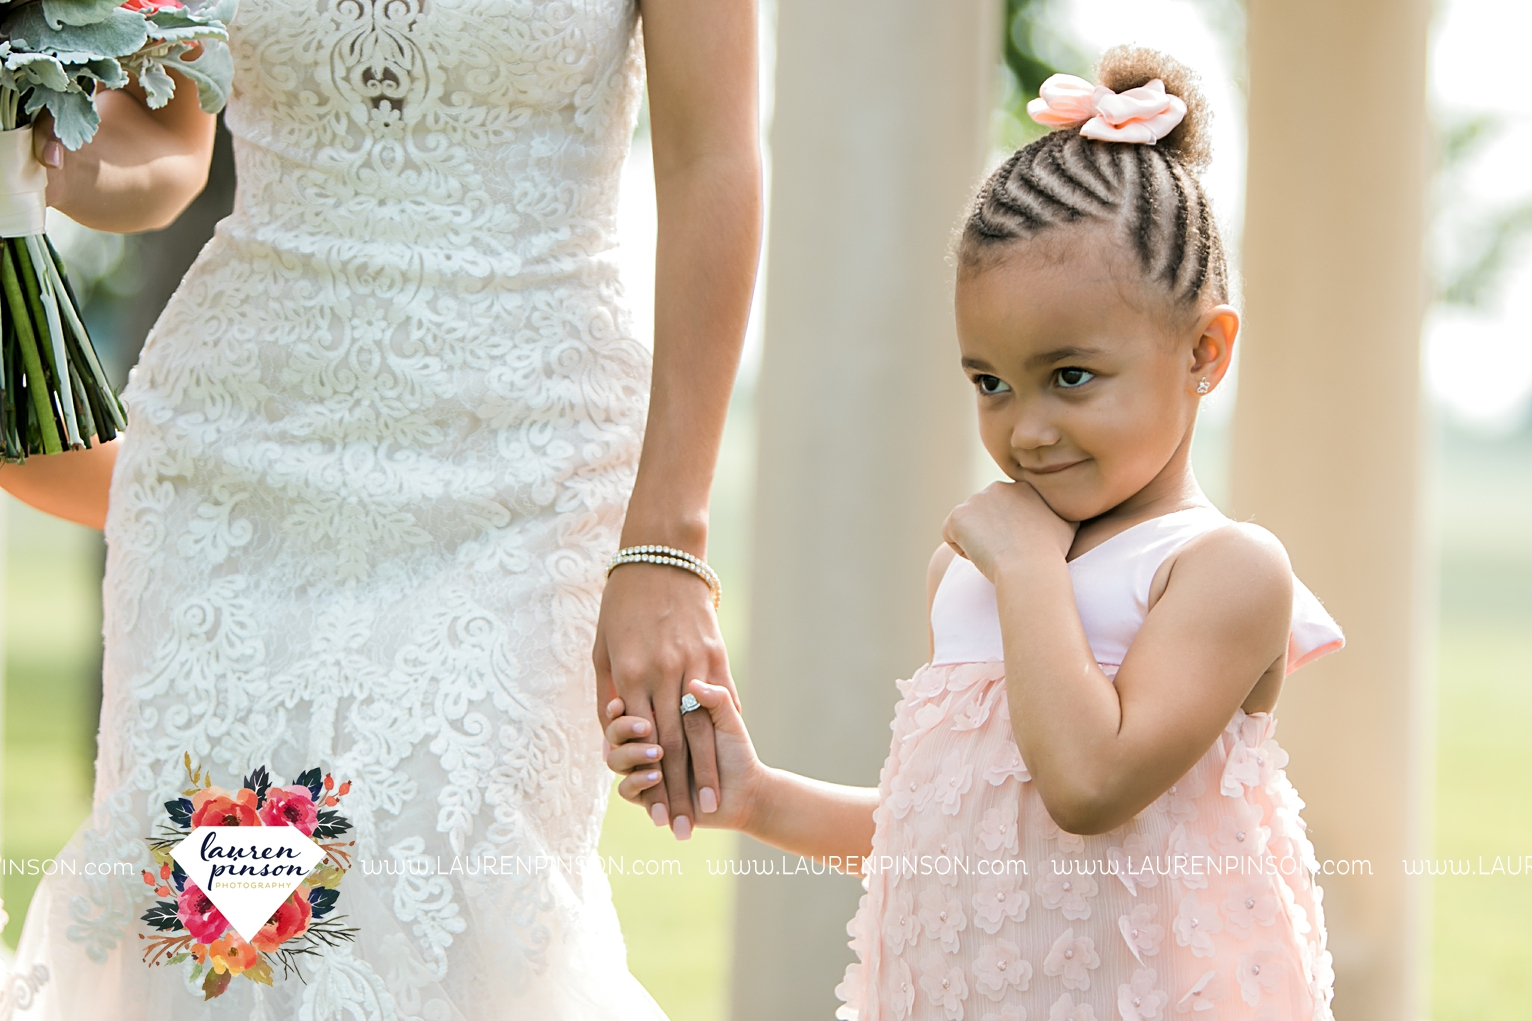 wichita-falls-wedding-nocona-comanche-rose-ranch-rustic-pink-gray-photography-00118.jpg